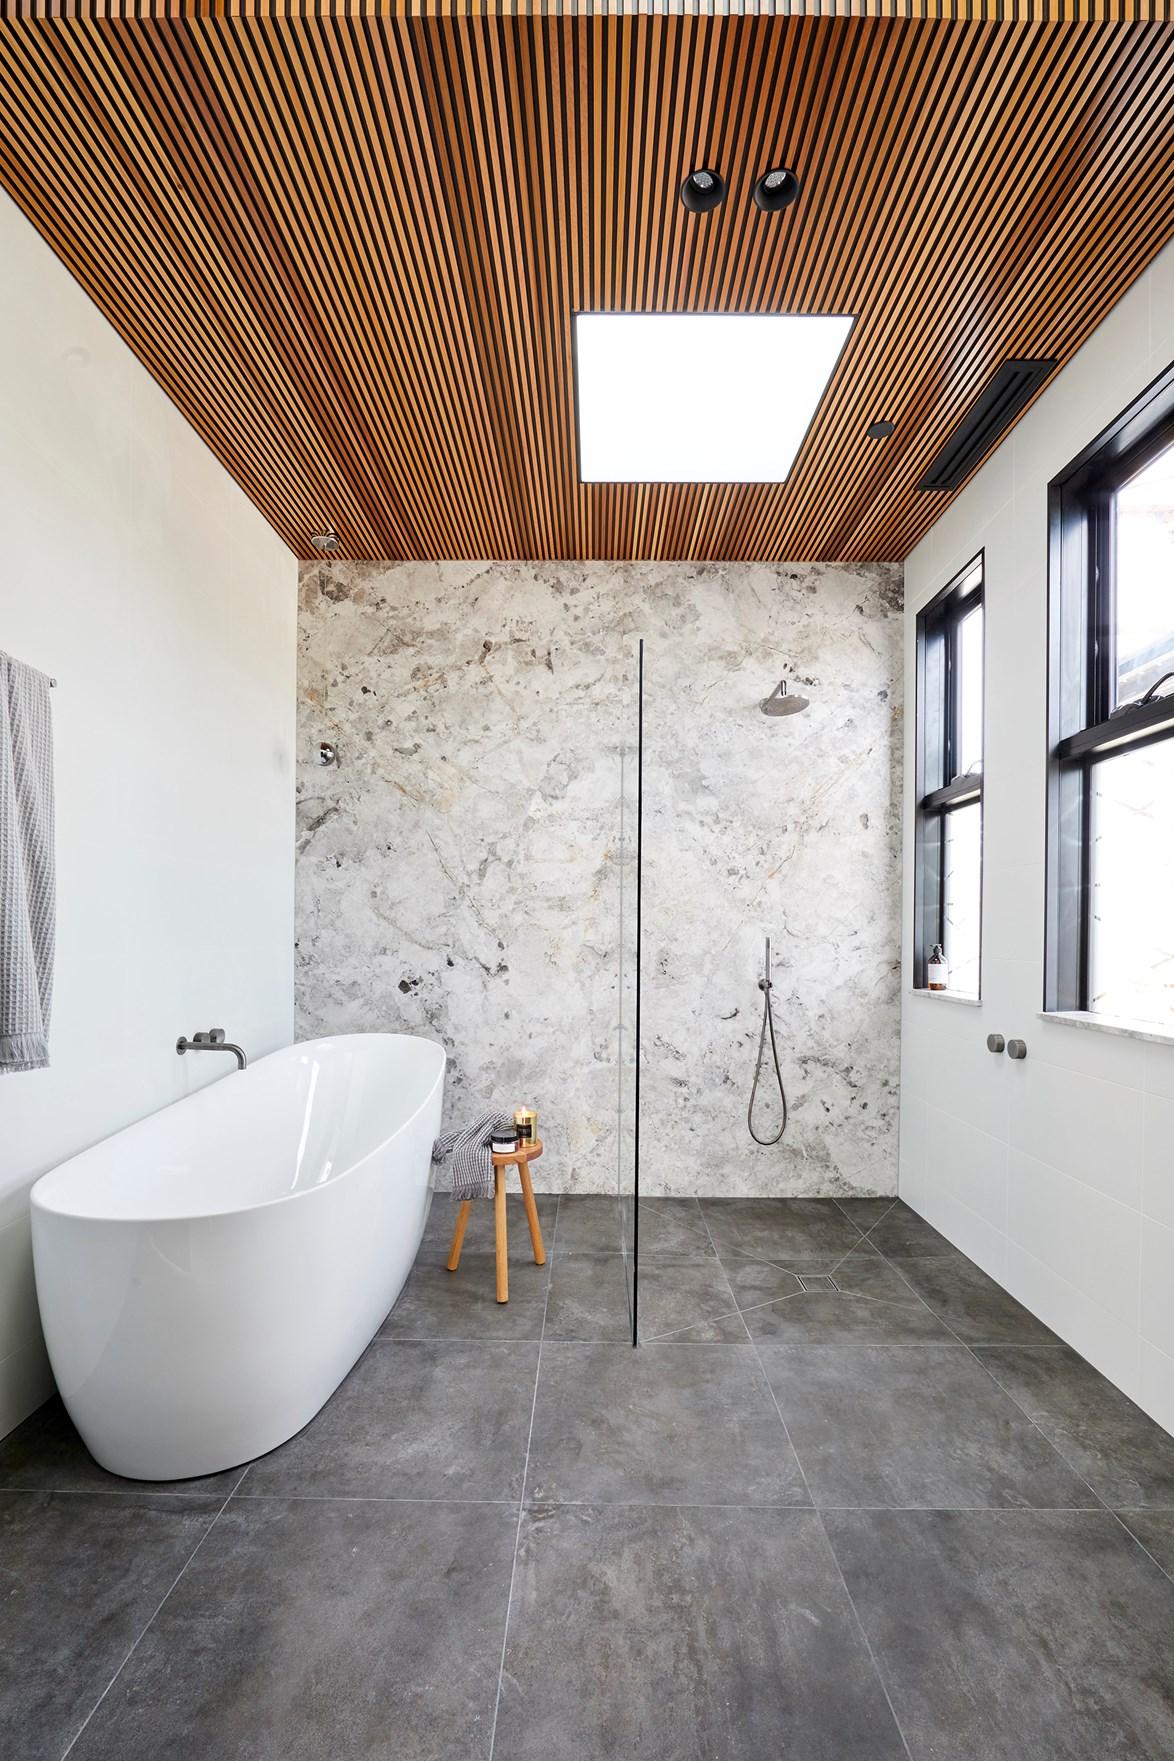 Soak up the luxury in this spectacular bathroom.